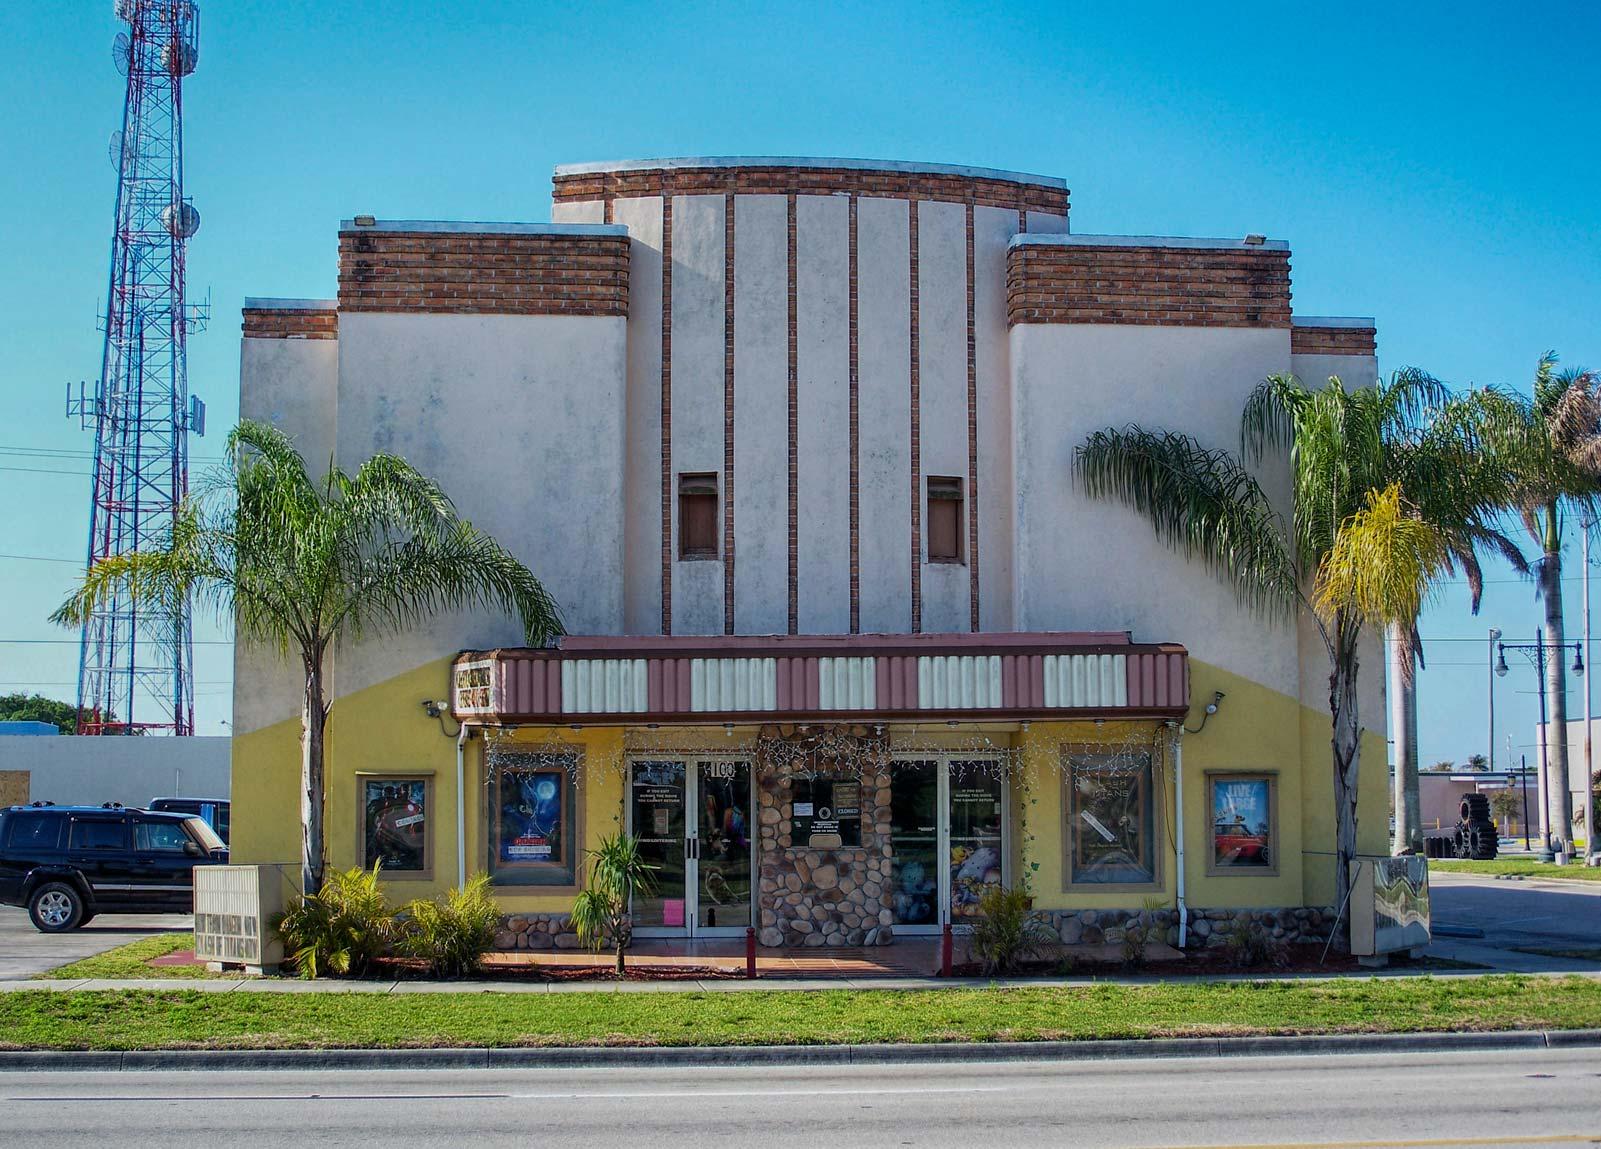 Clewiston Florida Lake Okeechobee Hotels In Clewiston